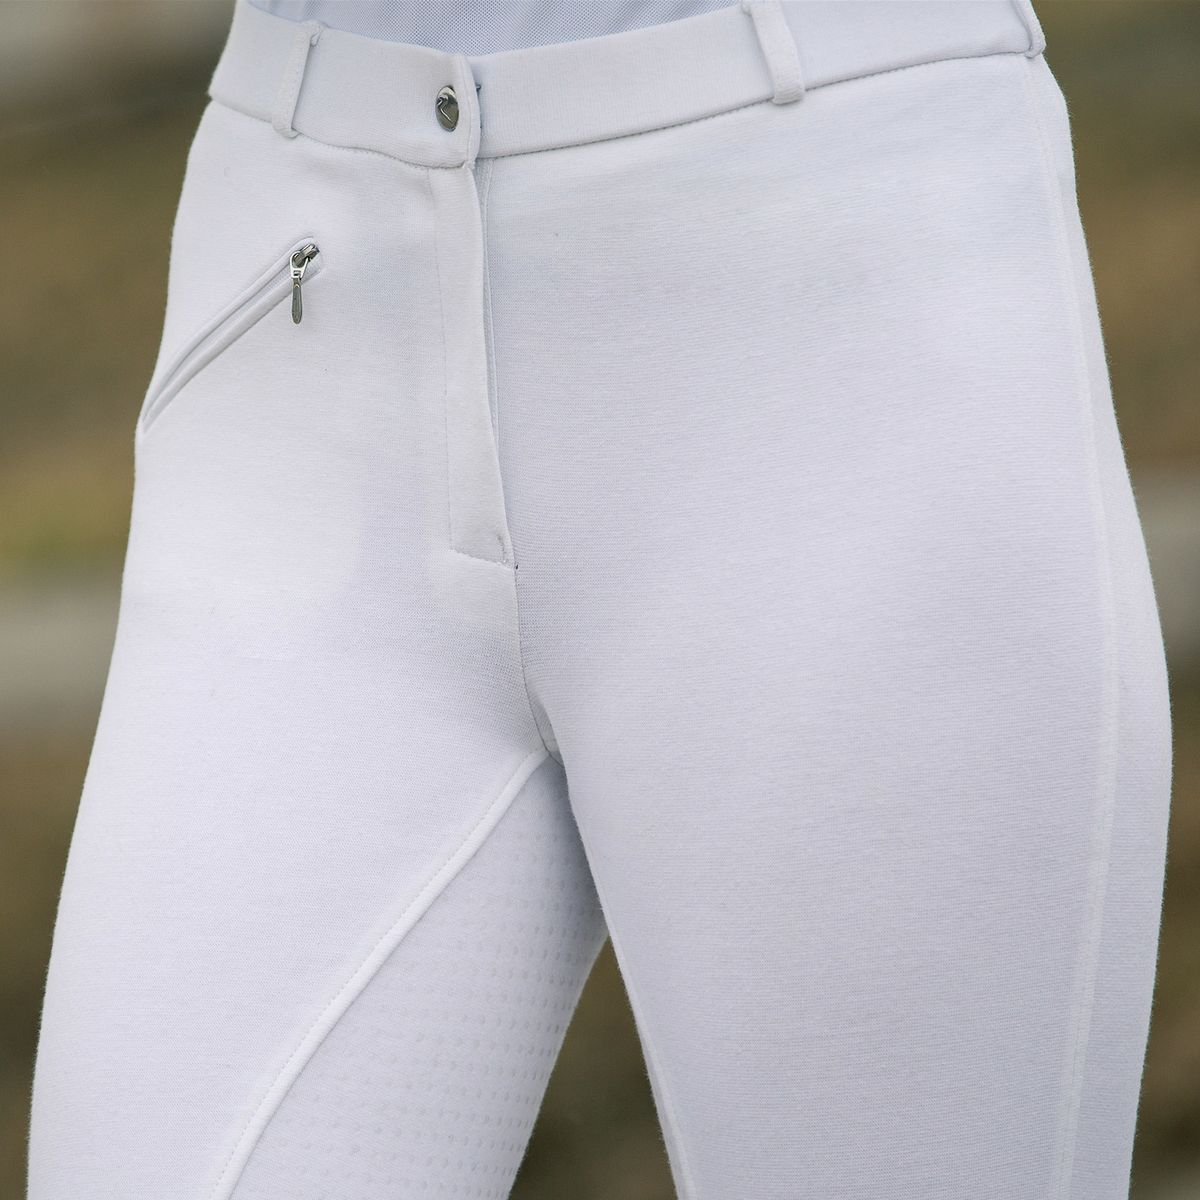 Horze-Women-039-s-Active-Silicone-Grip-Full-Seat-Riding-Breeches-Elastic-Leg-Bottoms thumbnail 18